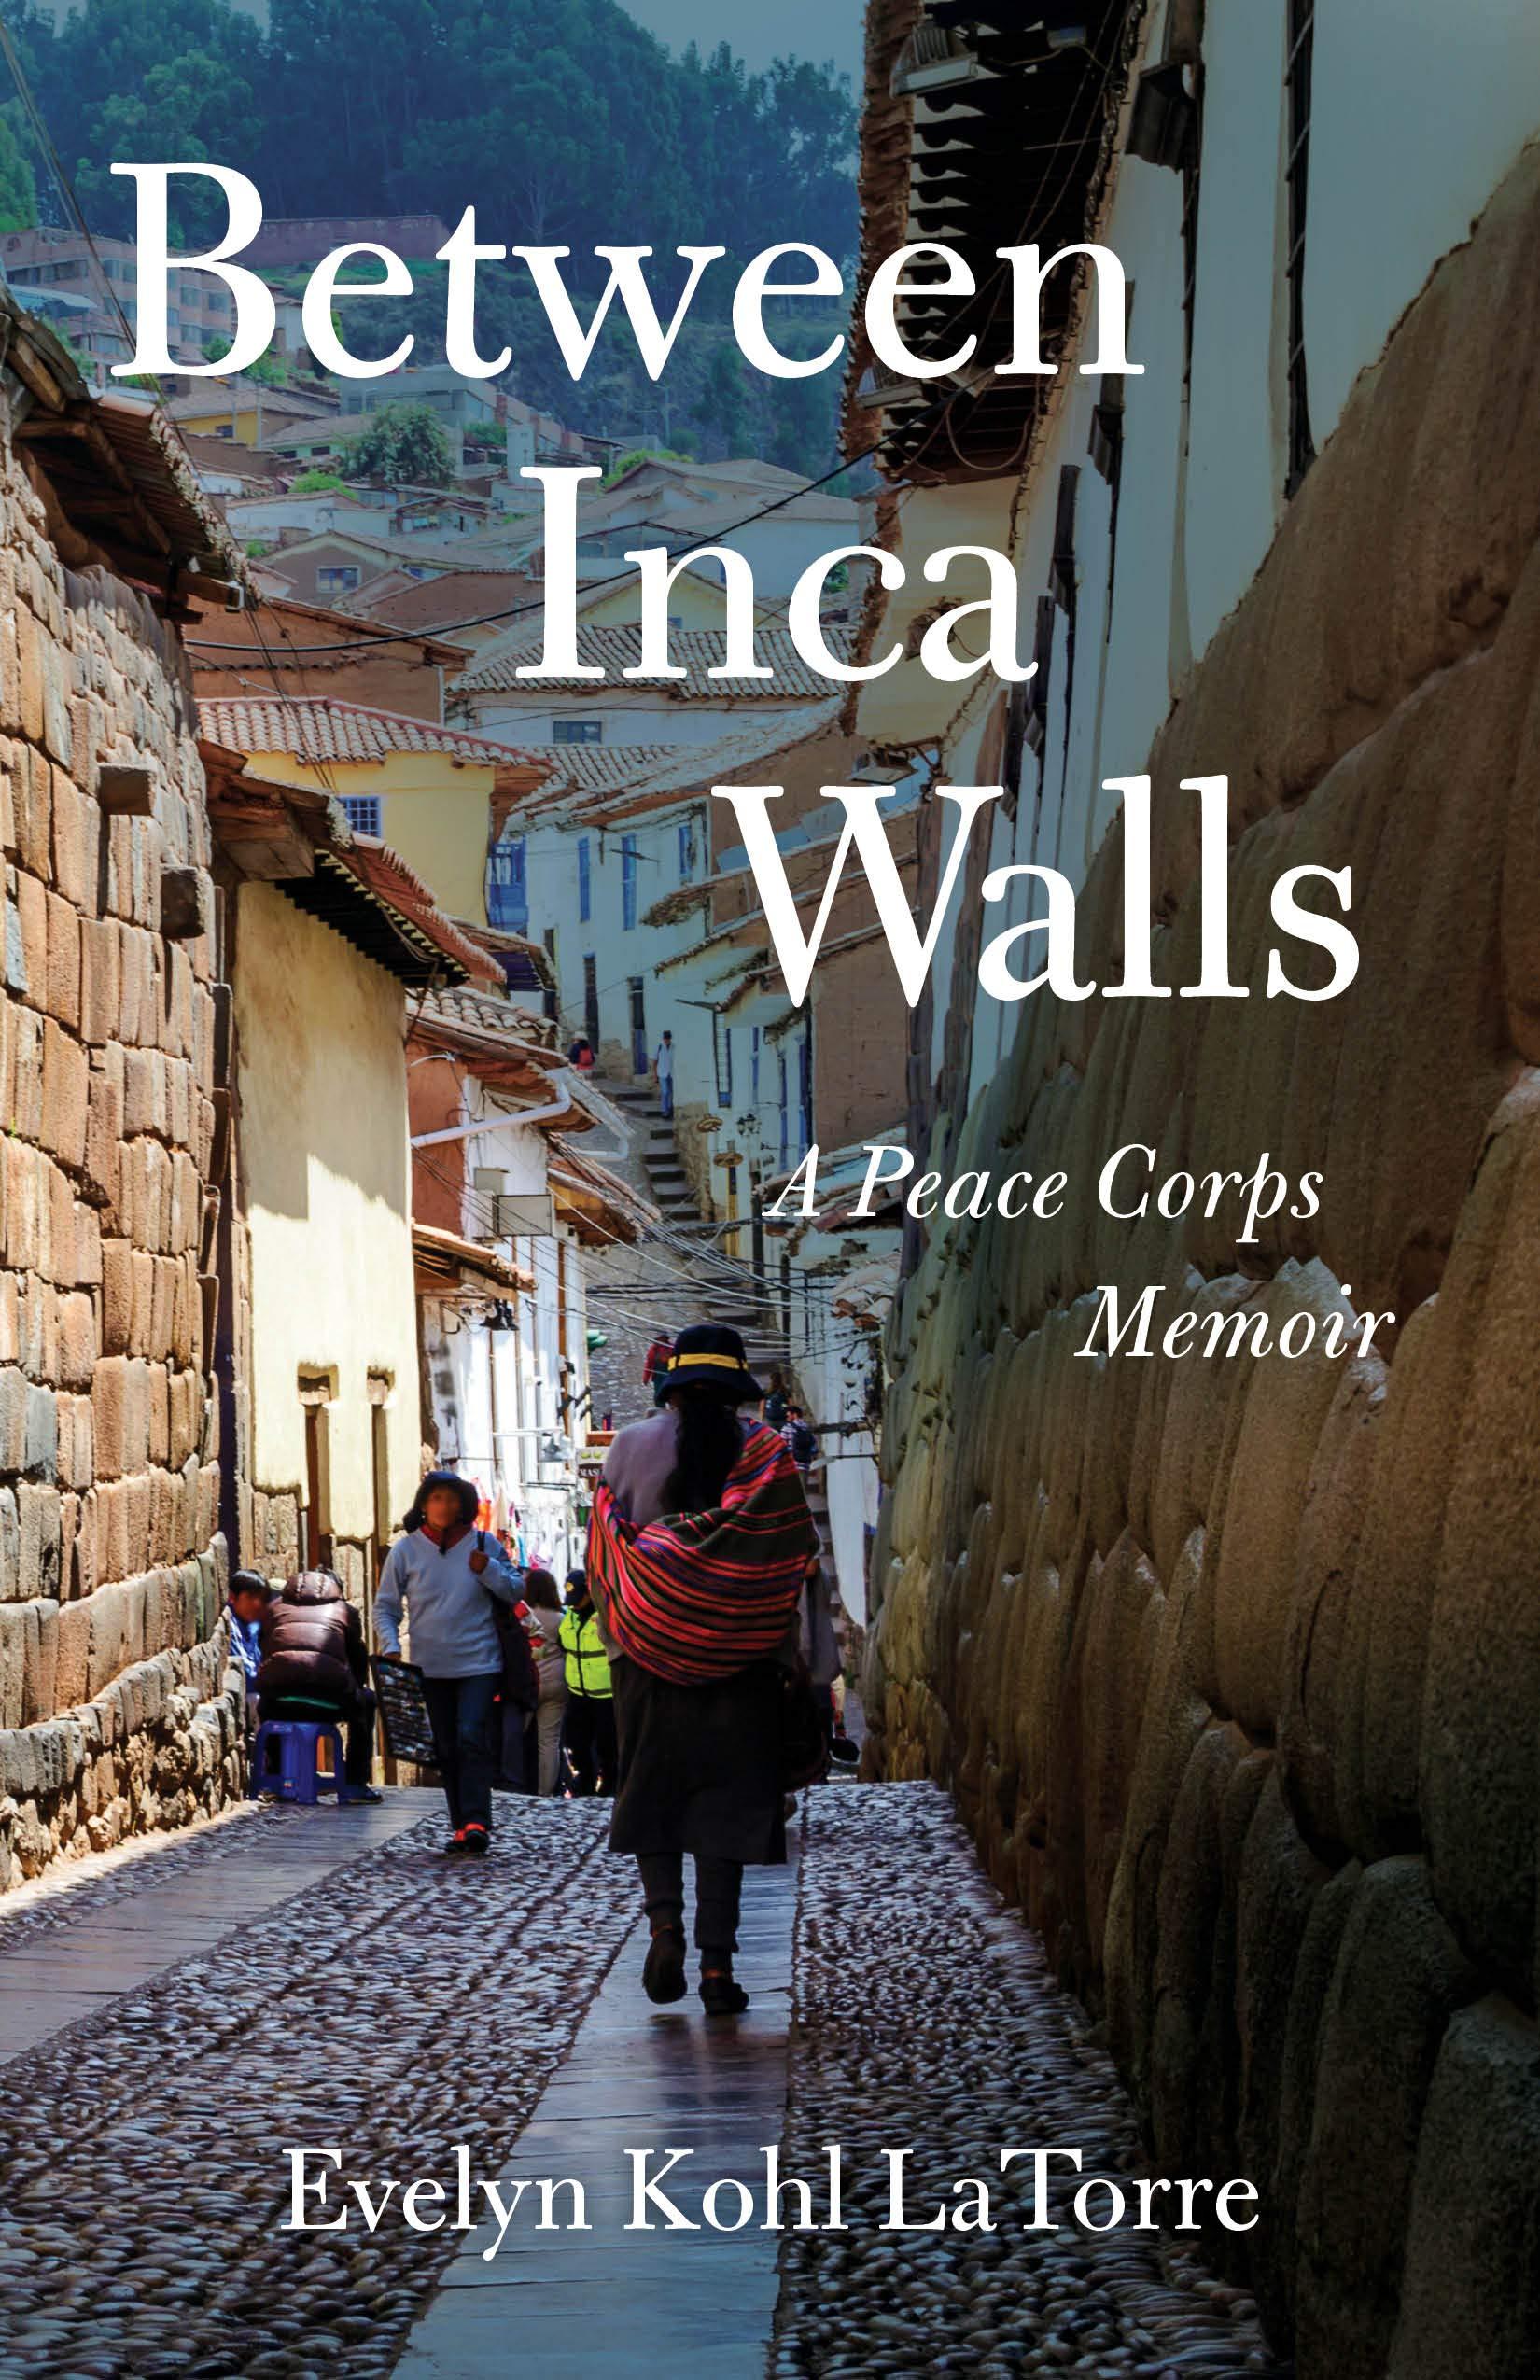 Between Inca Walls, A Peace Corps Memoir